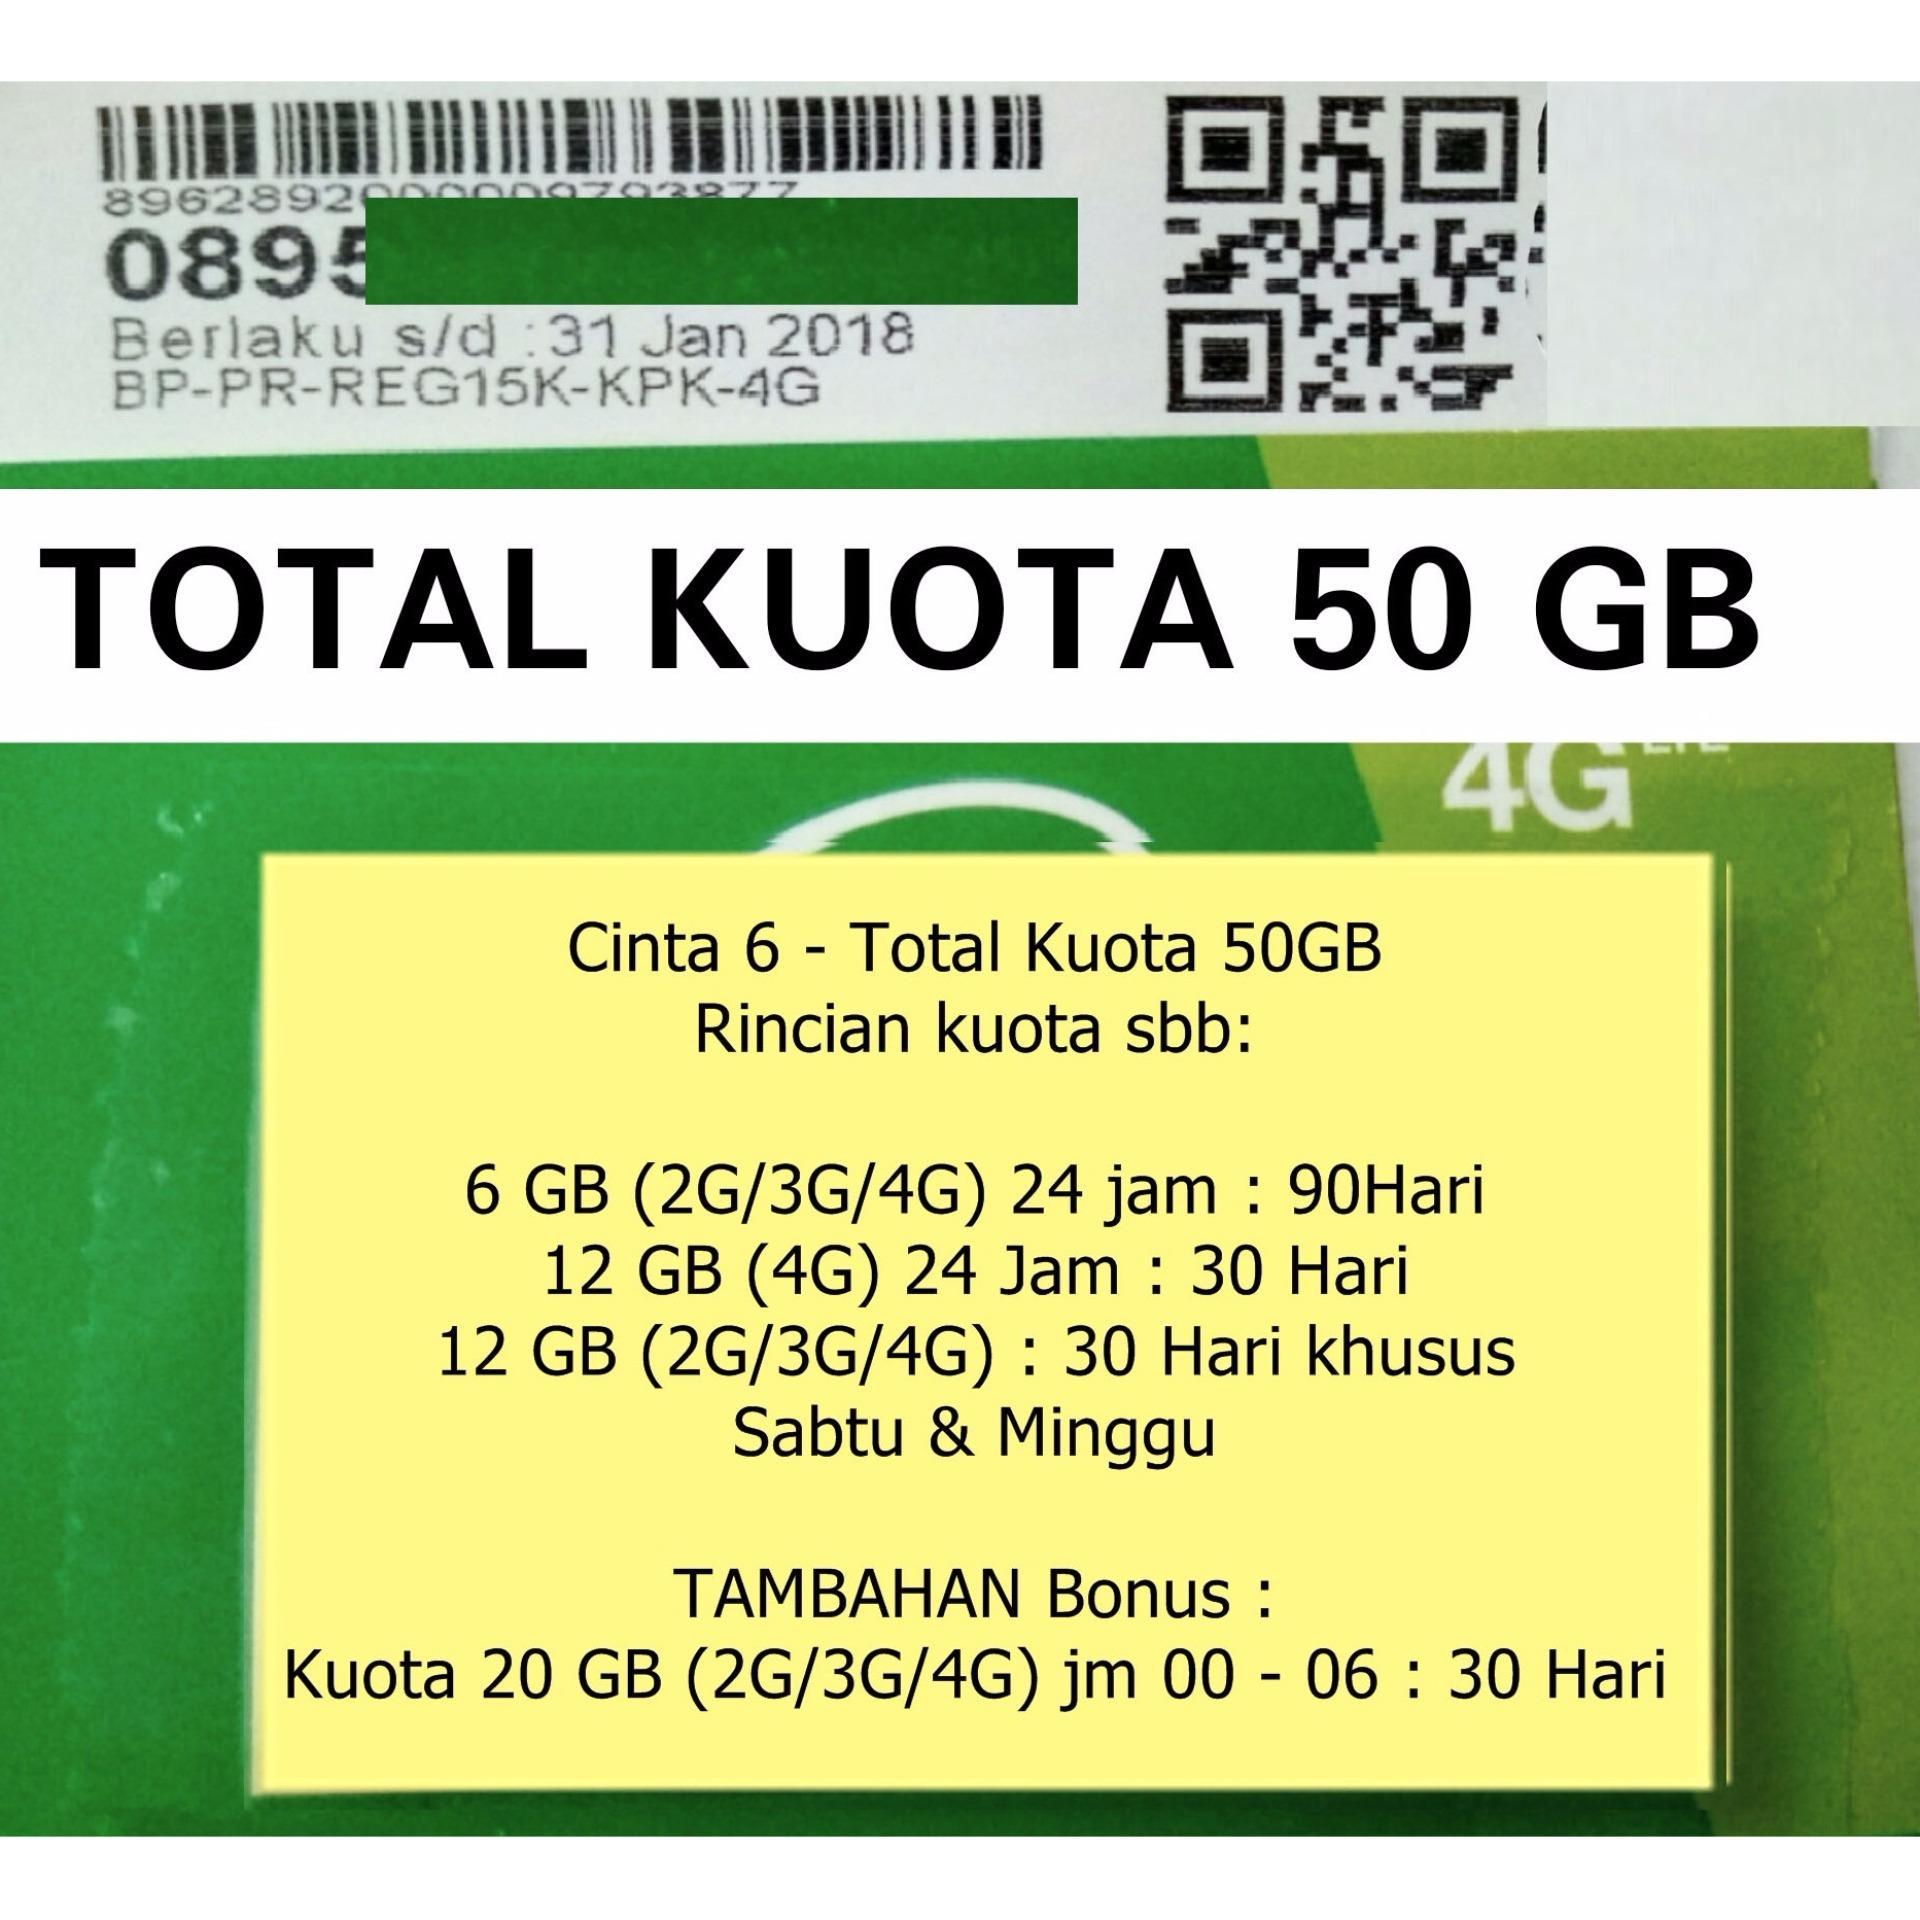 Hot Deals Kartu Perdana Tri Cinta 6 Kuota 30gb Three Cinta6 Smartfren 4g Gsm 55 Gb